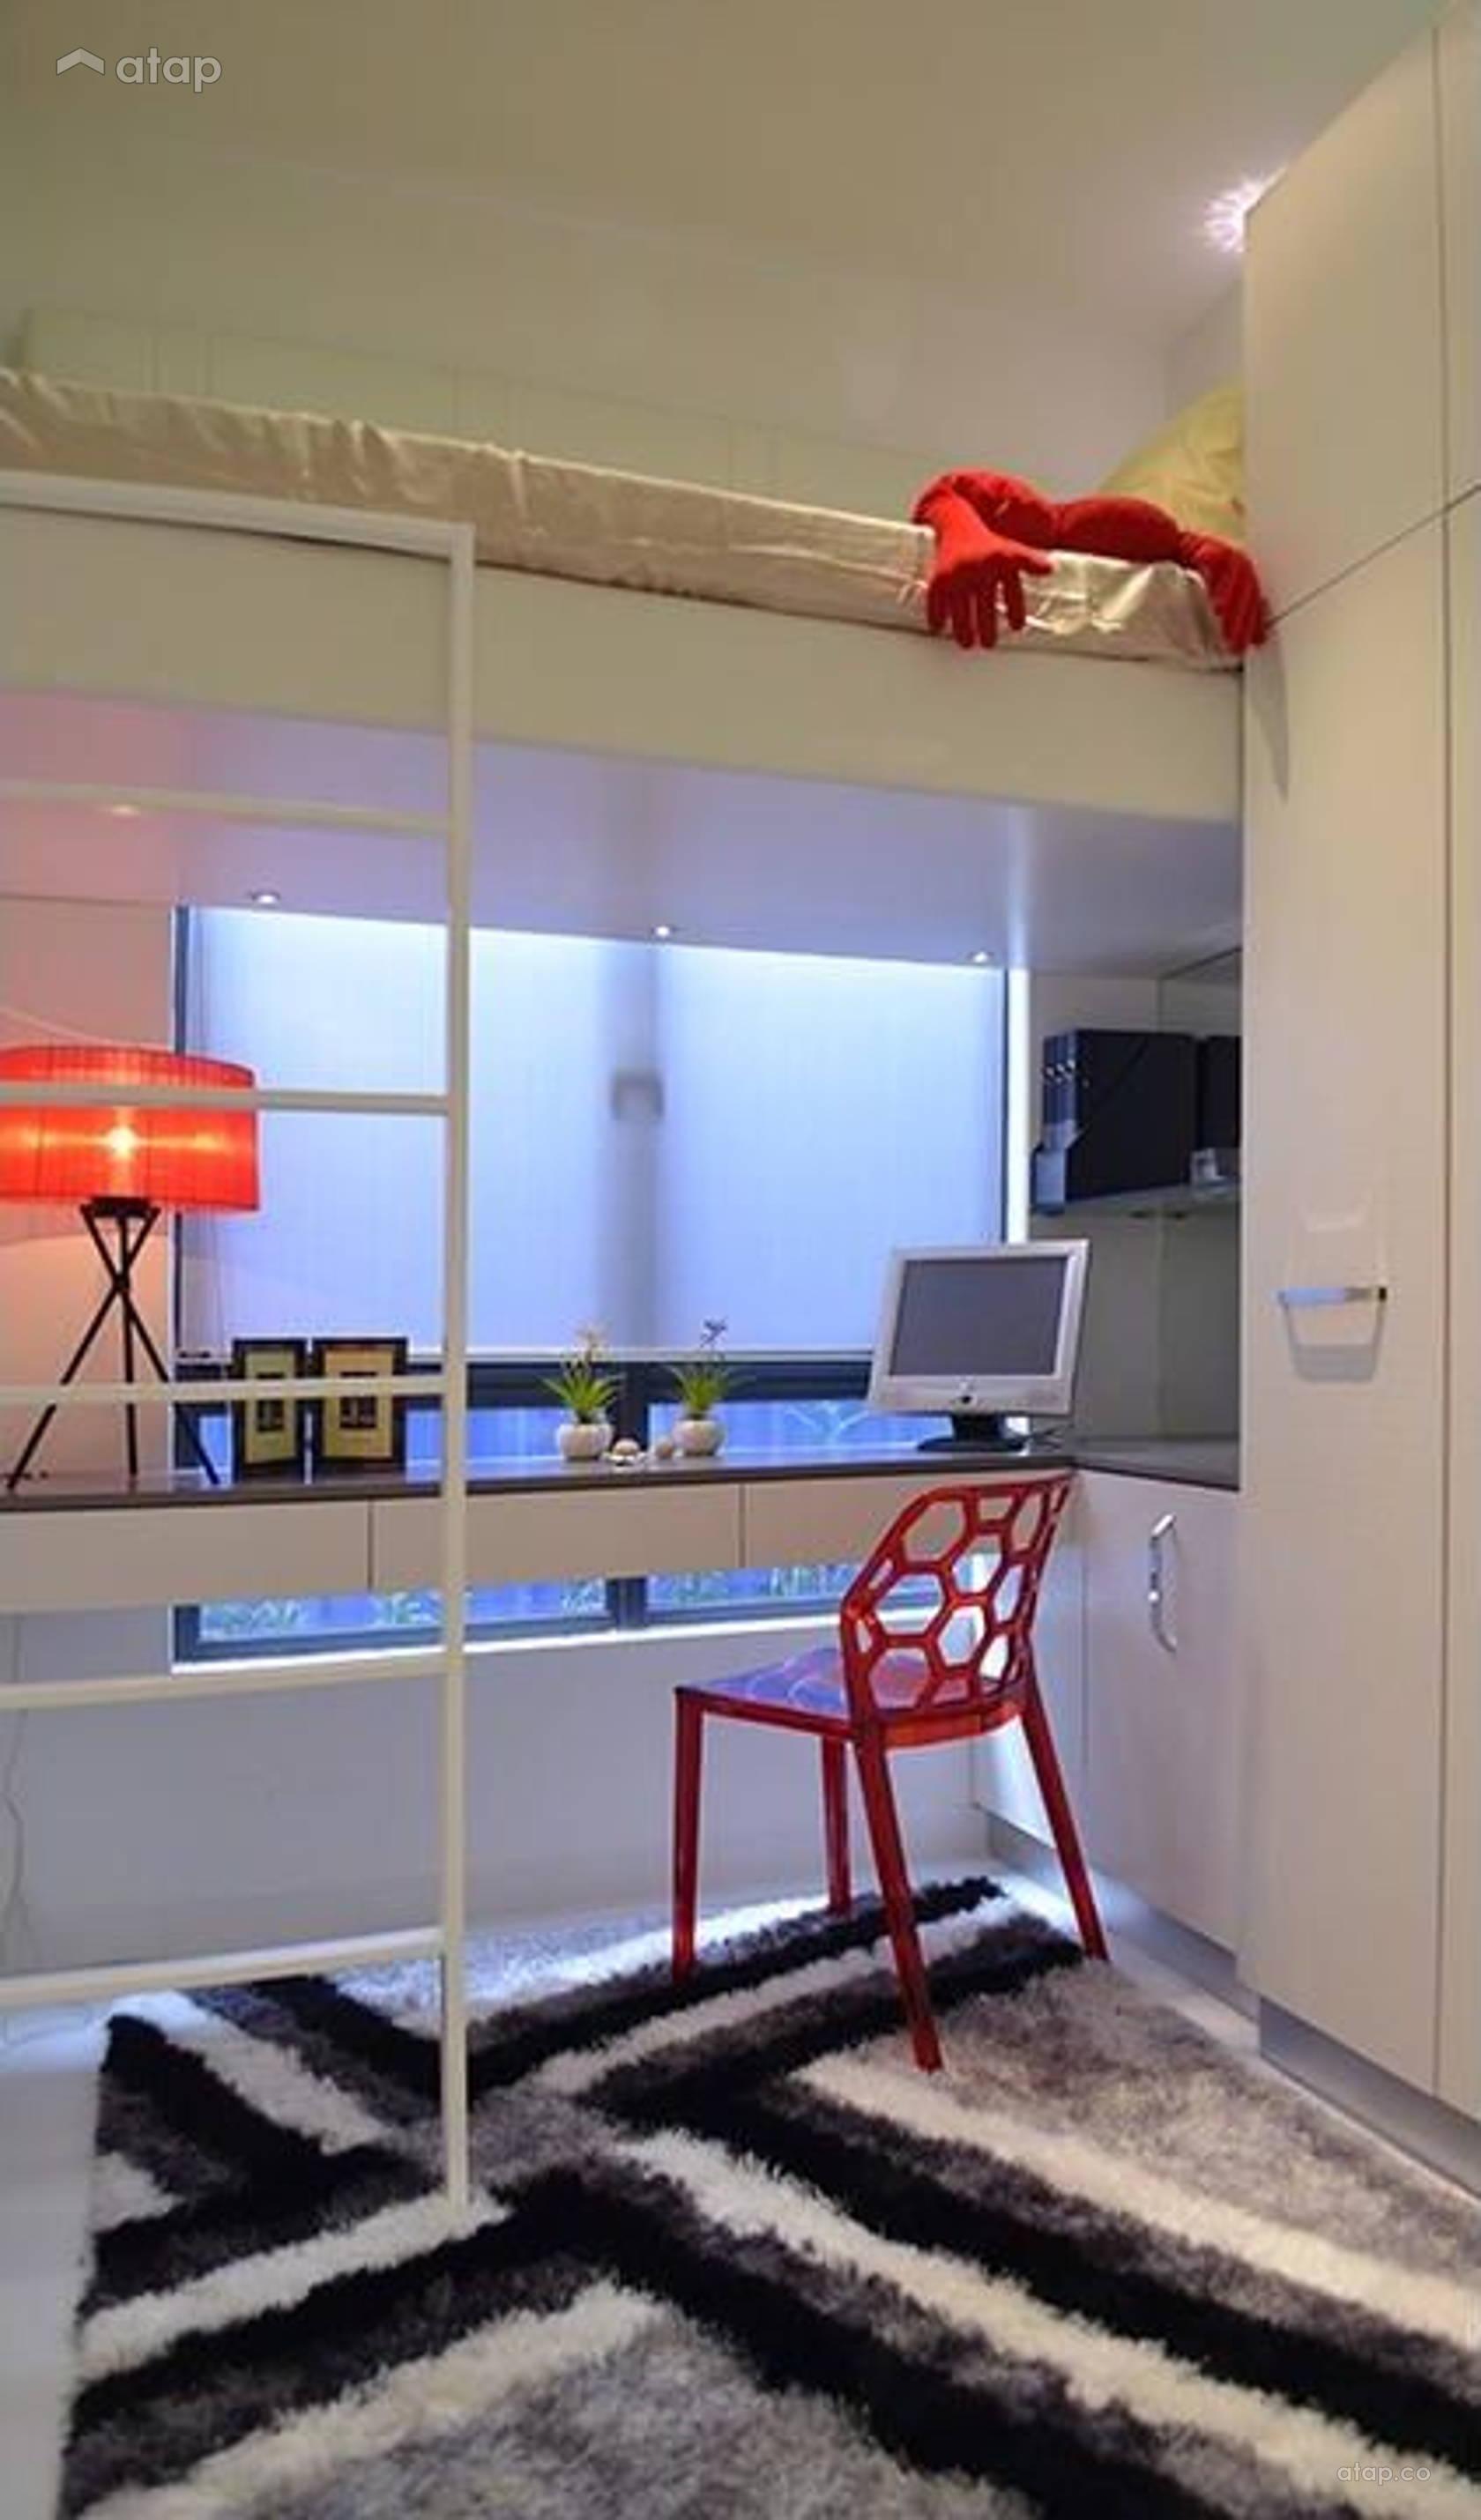 Condominium Study Room: Contemporary Modern Study Room Bedroom Condominium Design